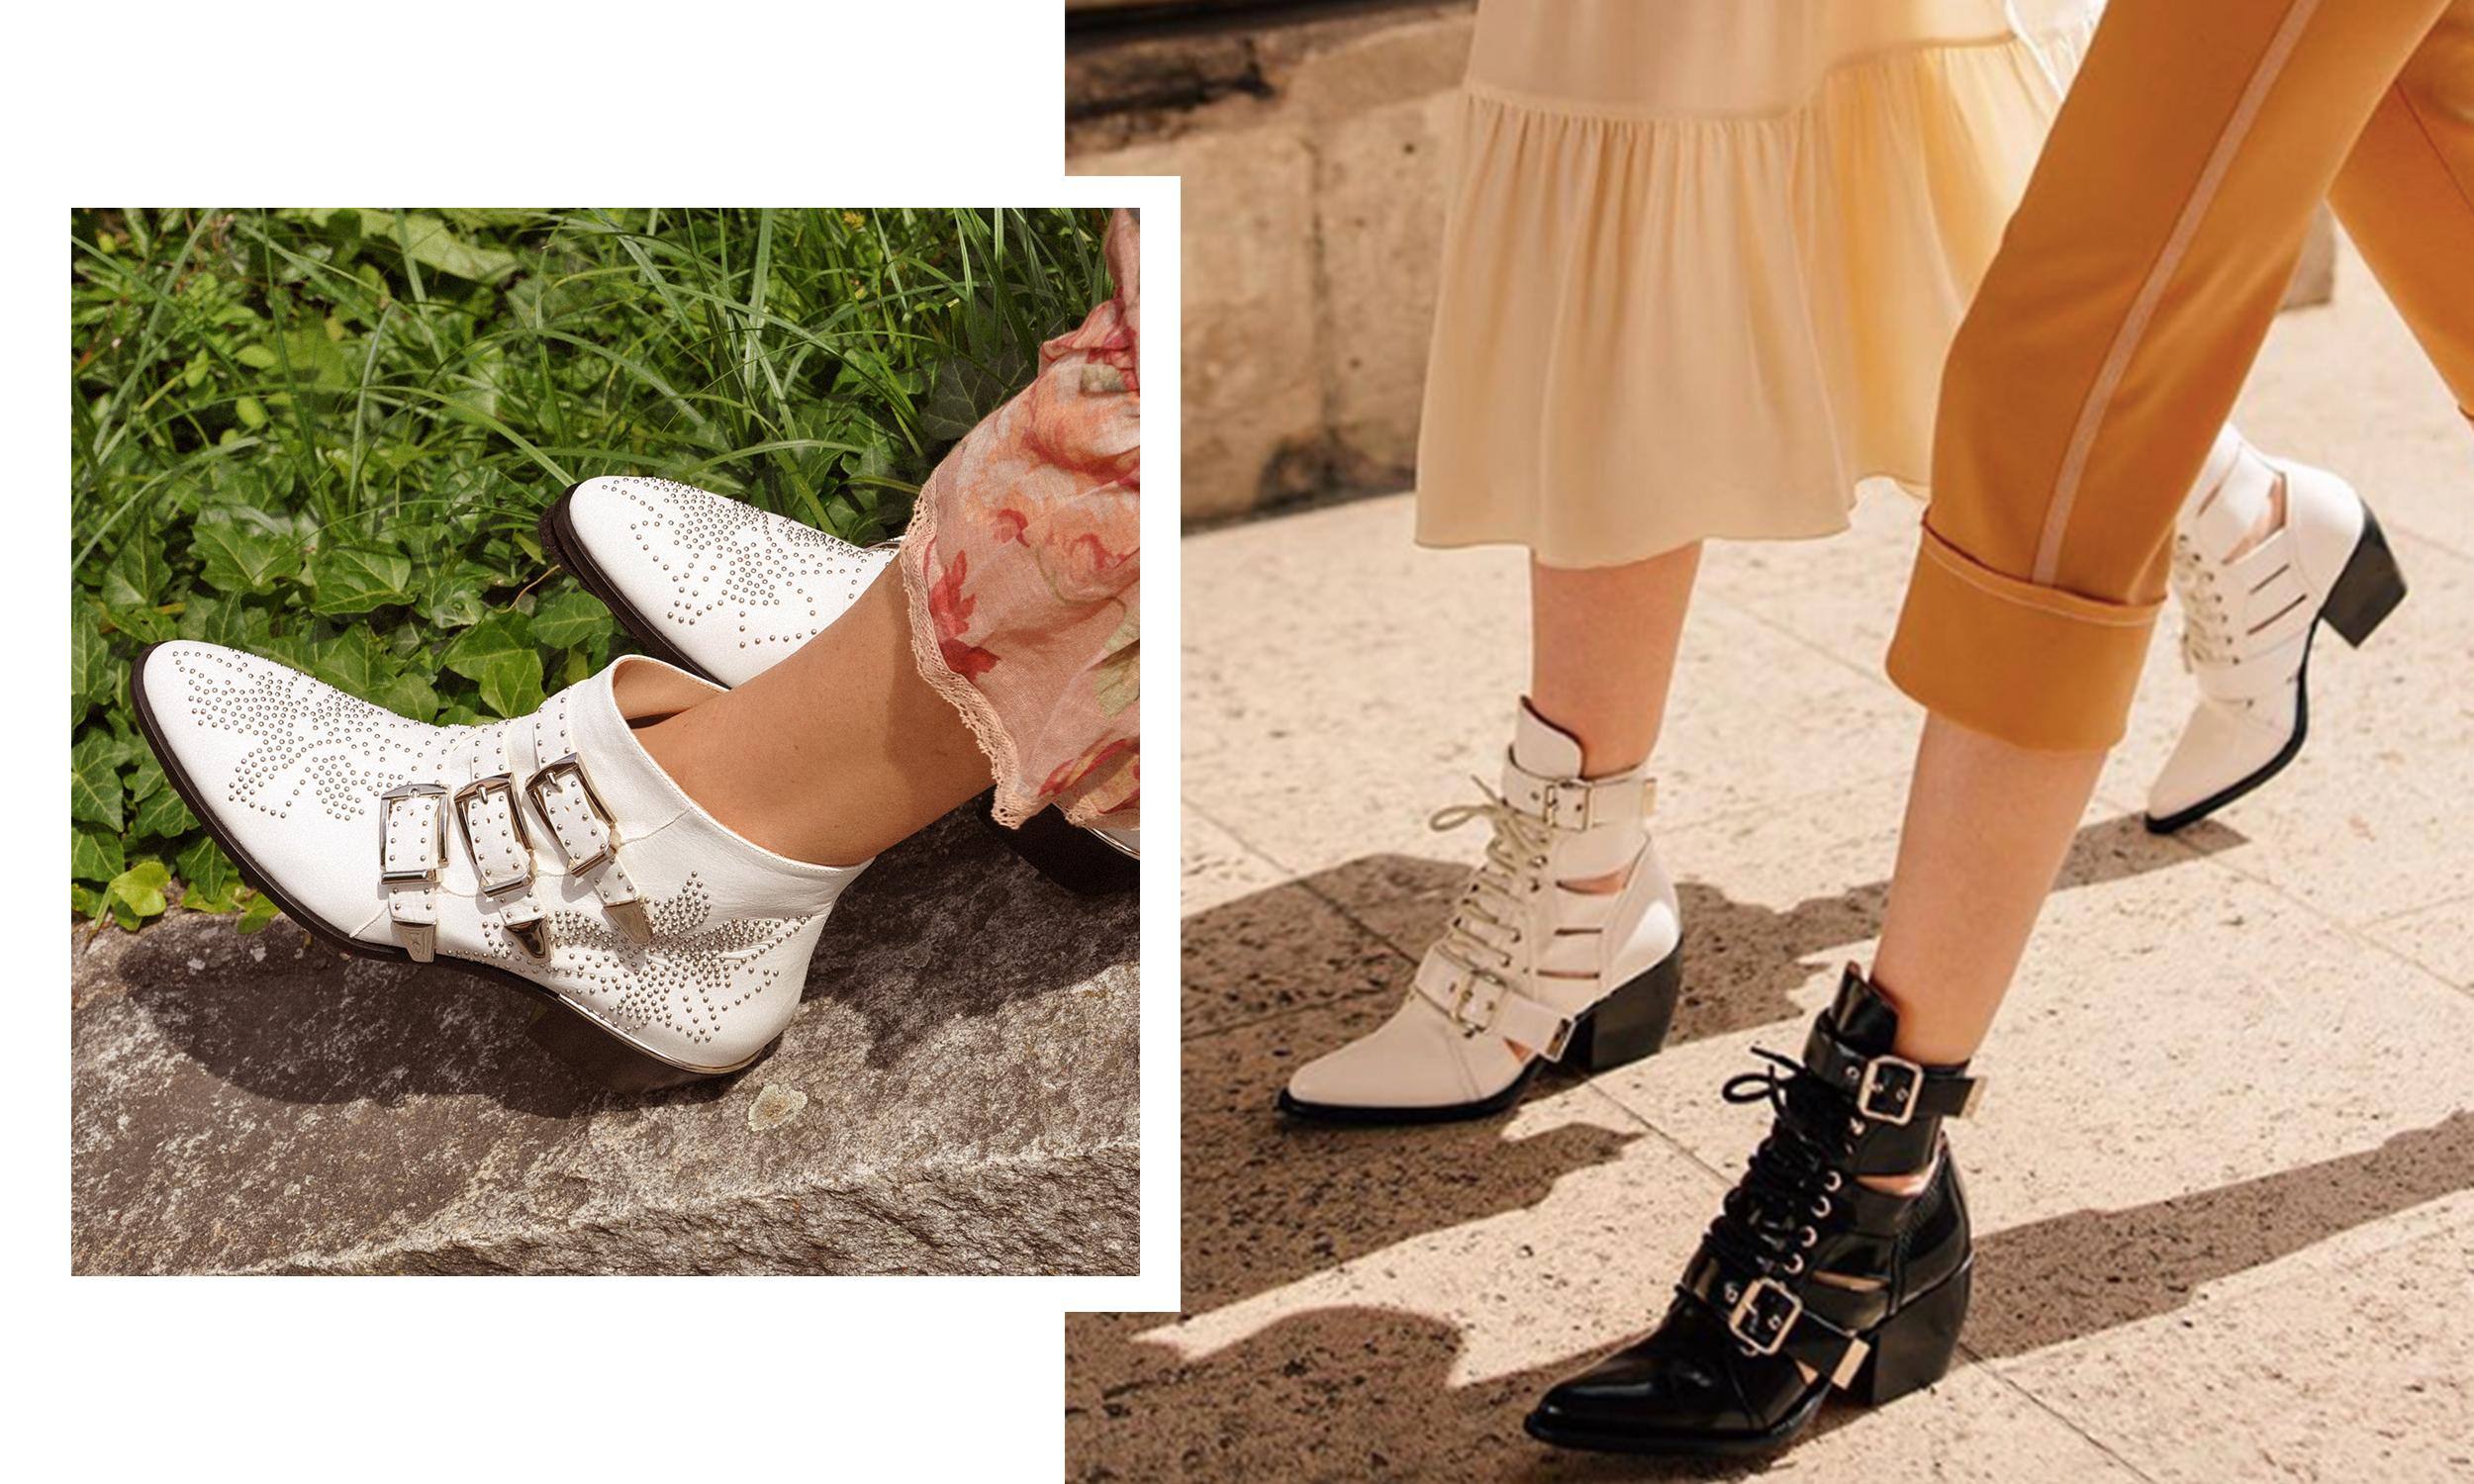 chloe-emerson-renaldi-shoes.jpg